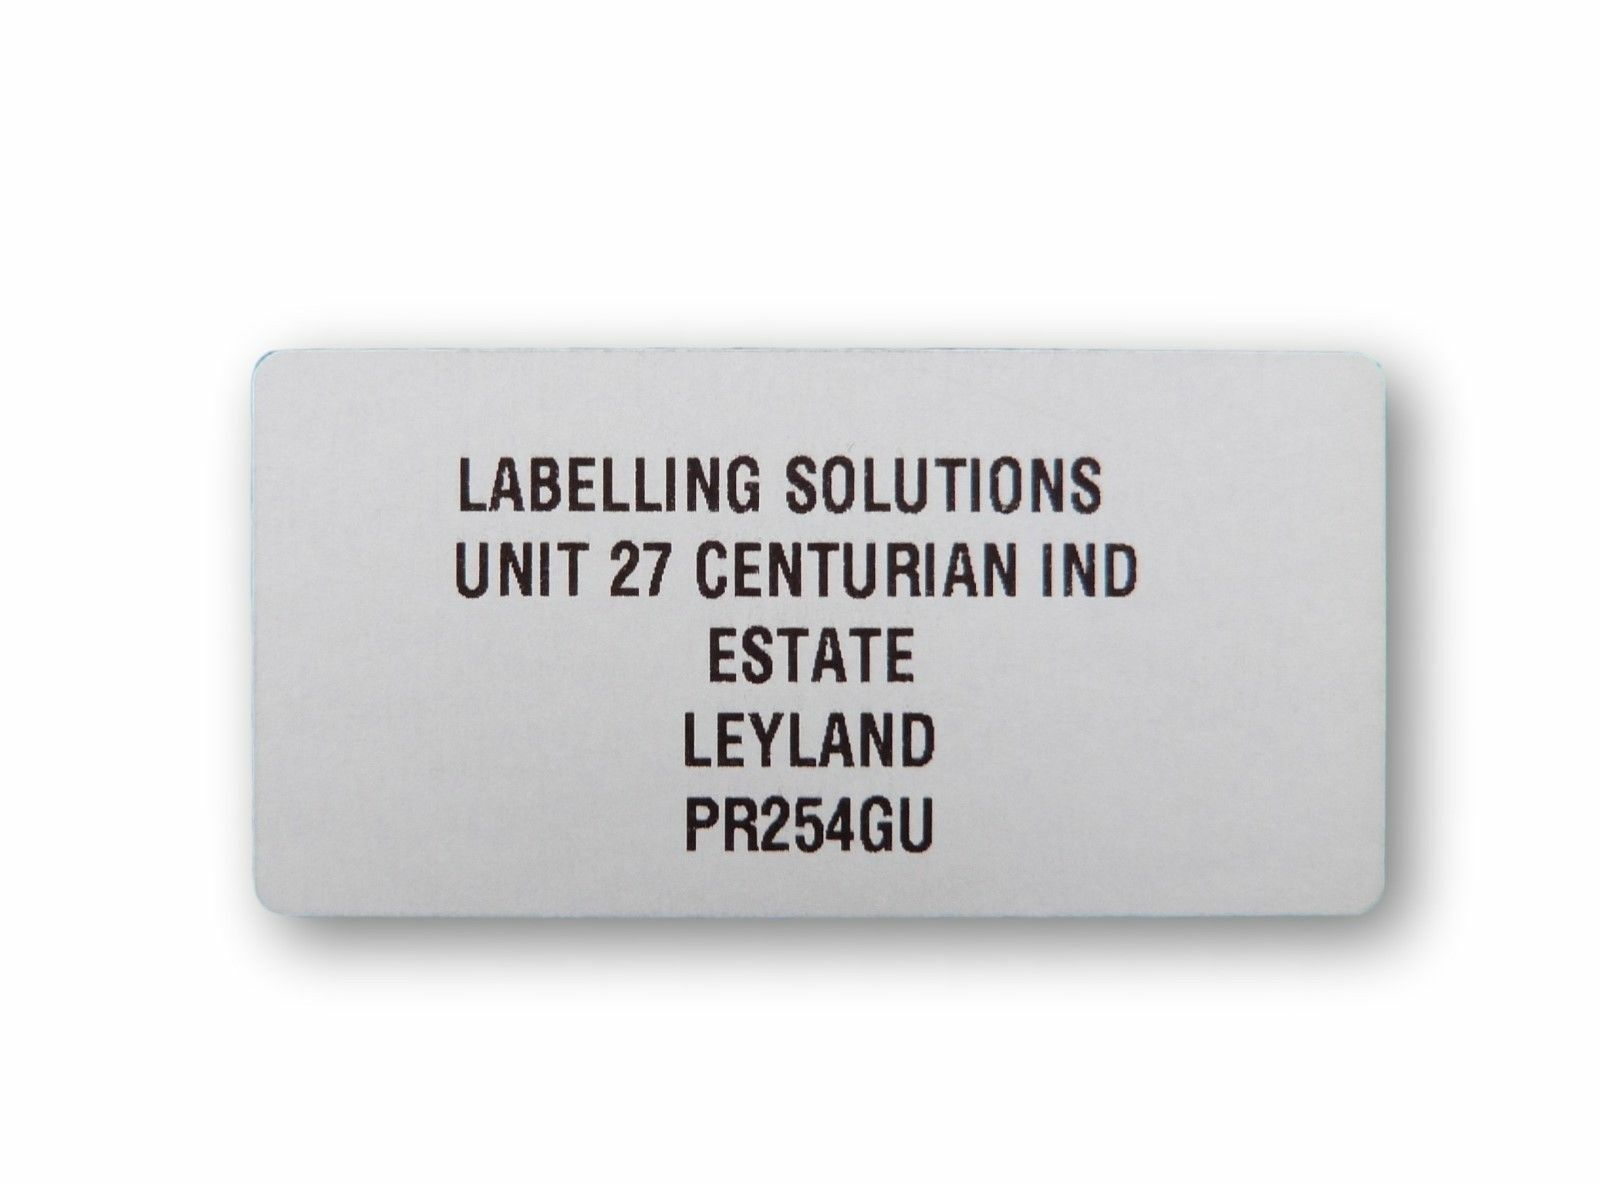 100 x personalised stickers 25mm x 50mm custom address return labels postage